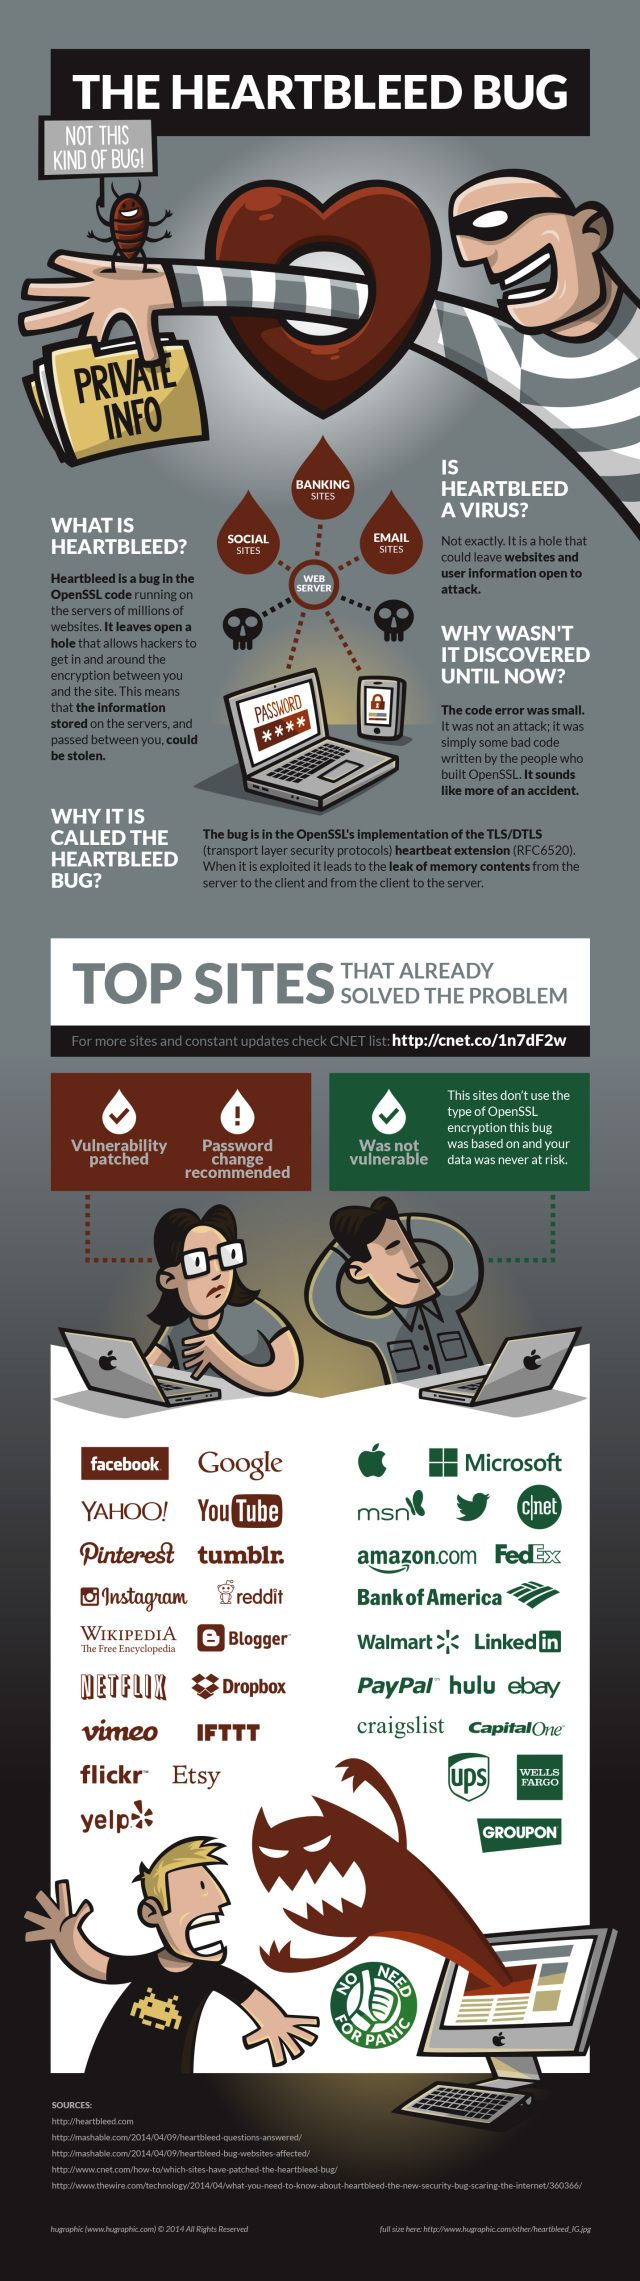 The Heartbleed bug #infografia #infographic #internet